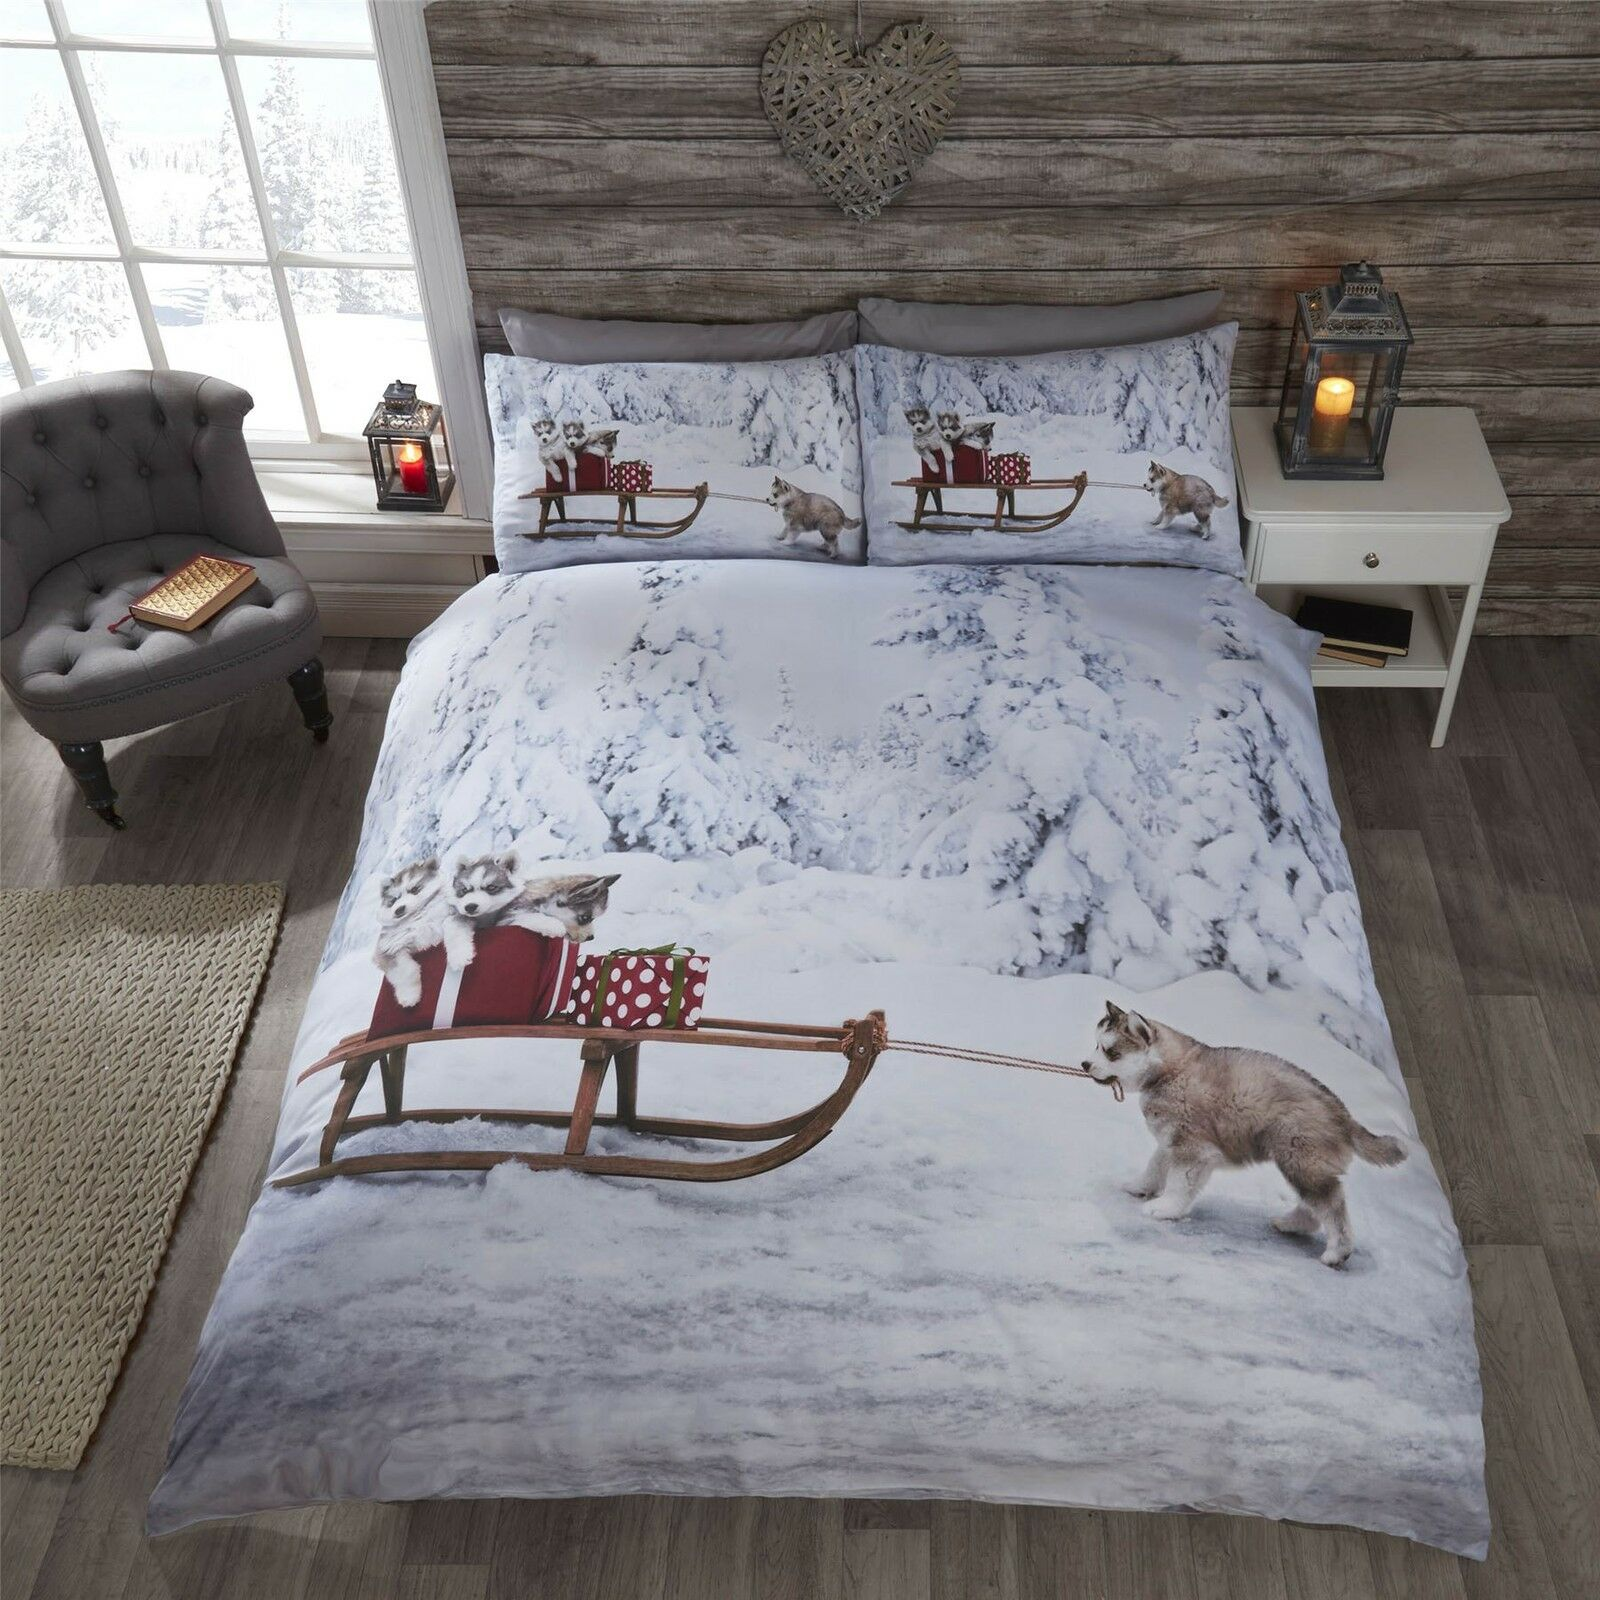 Weihnachten Husky Hund Welpen Schlitten Schnee Bäume white Beige Kingsize